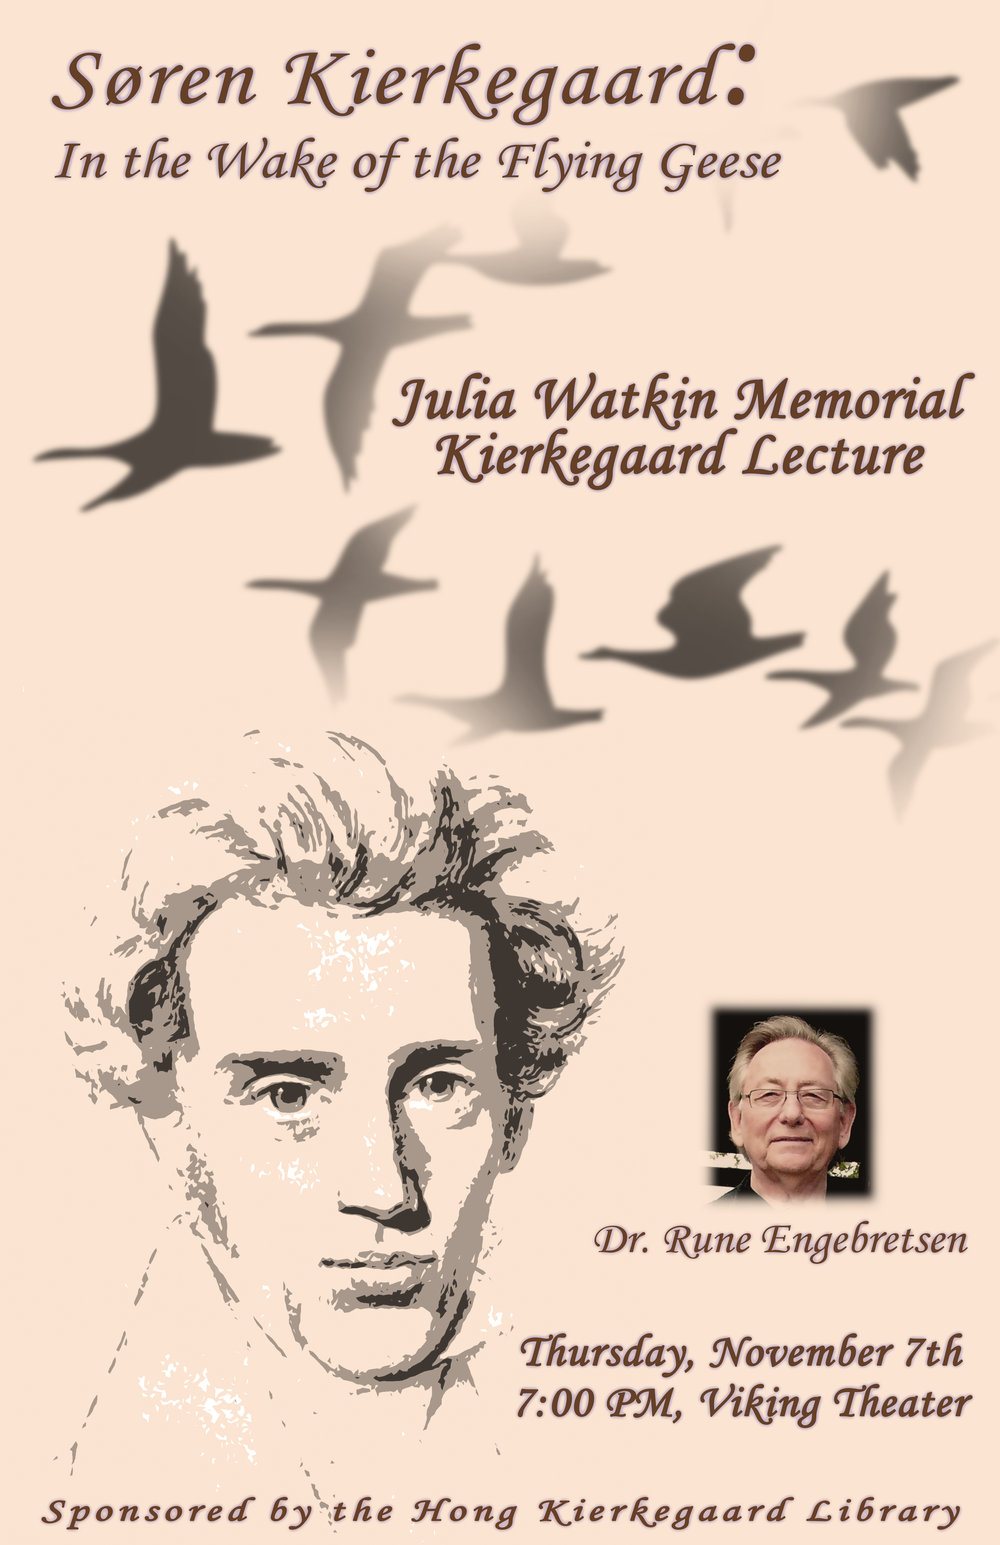 Kierkegaard, October 2013